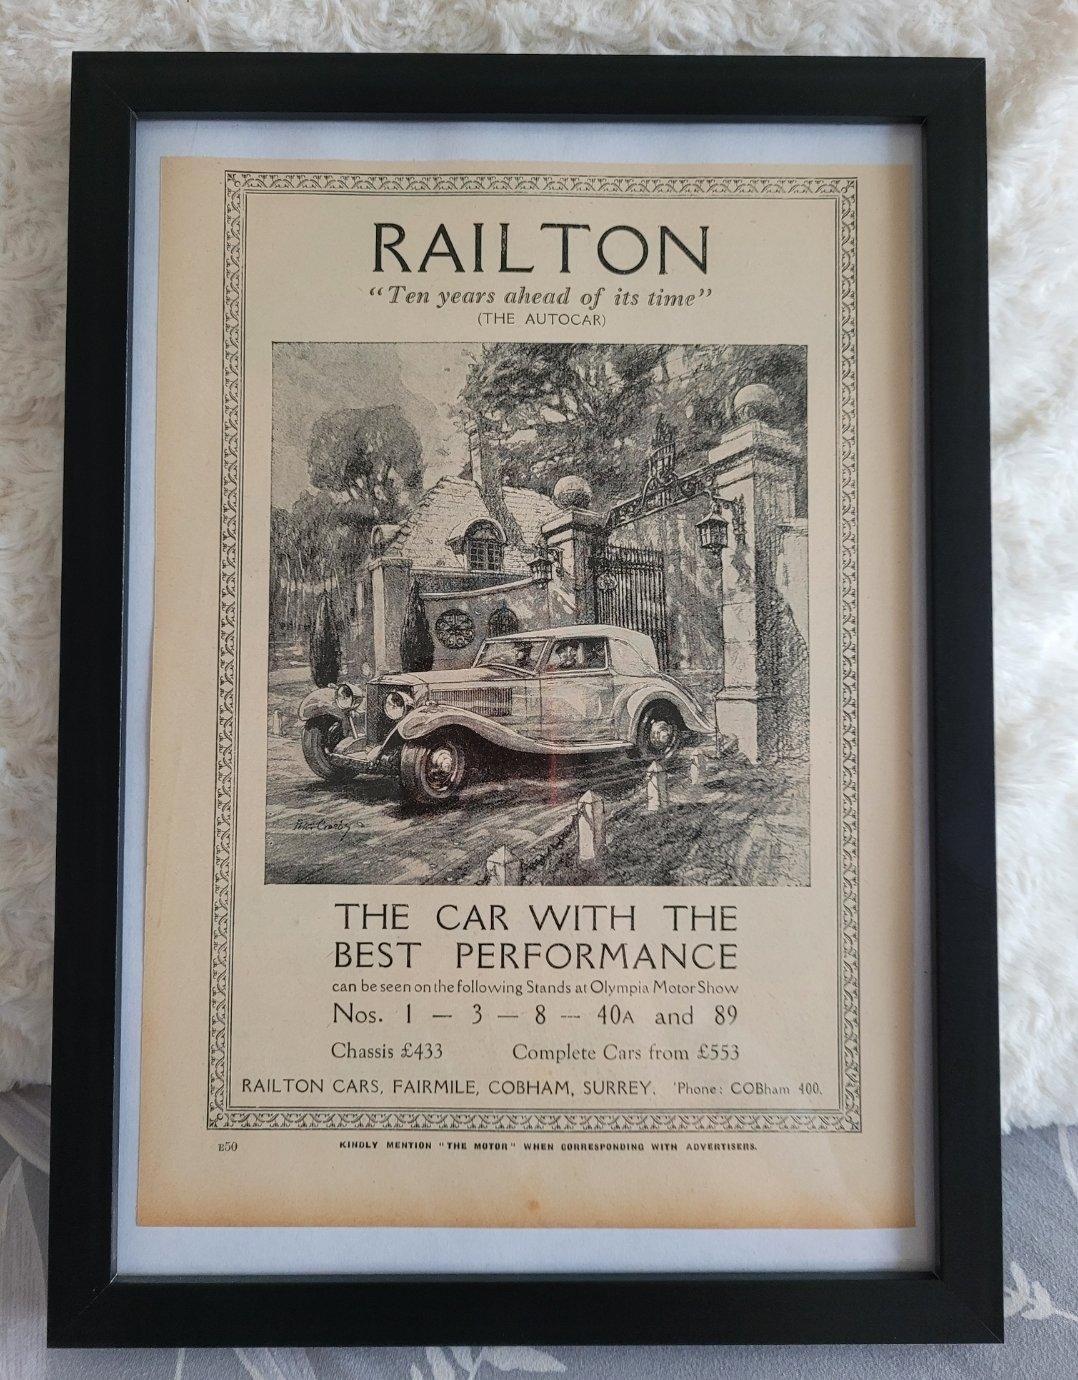 Original 1935 Railton Framed Advert